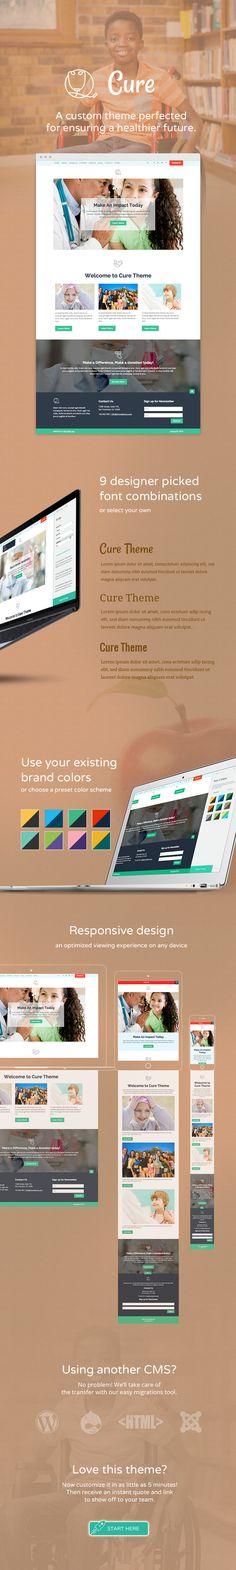 Use Morweb CMS to build a custom website for your nonprofit or association. Custom Website, Themes Themes, Website Themes, Non Profit, The Cure, Software, Health, Design, Salud